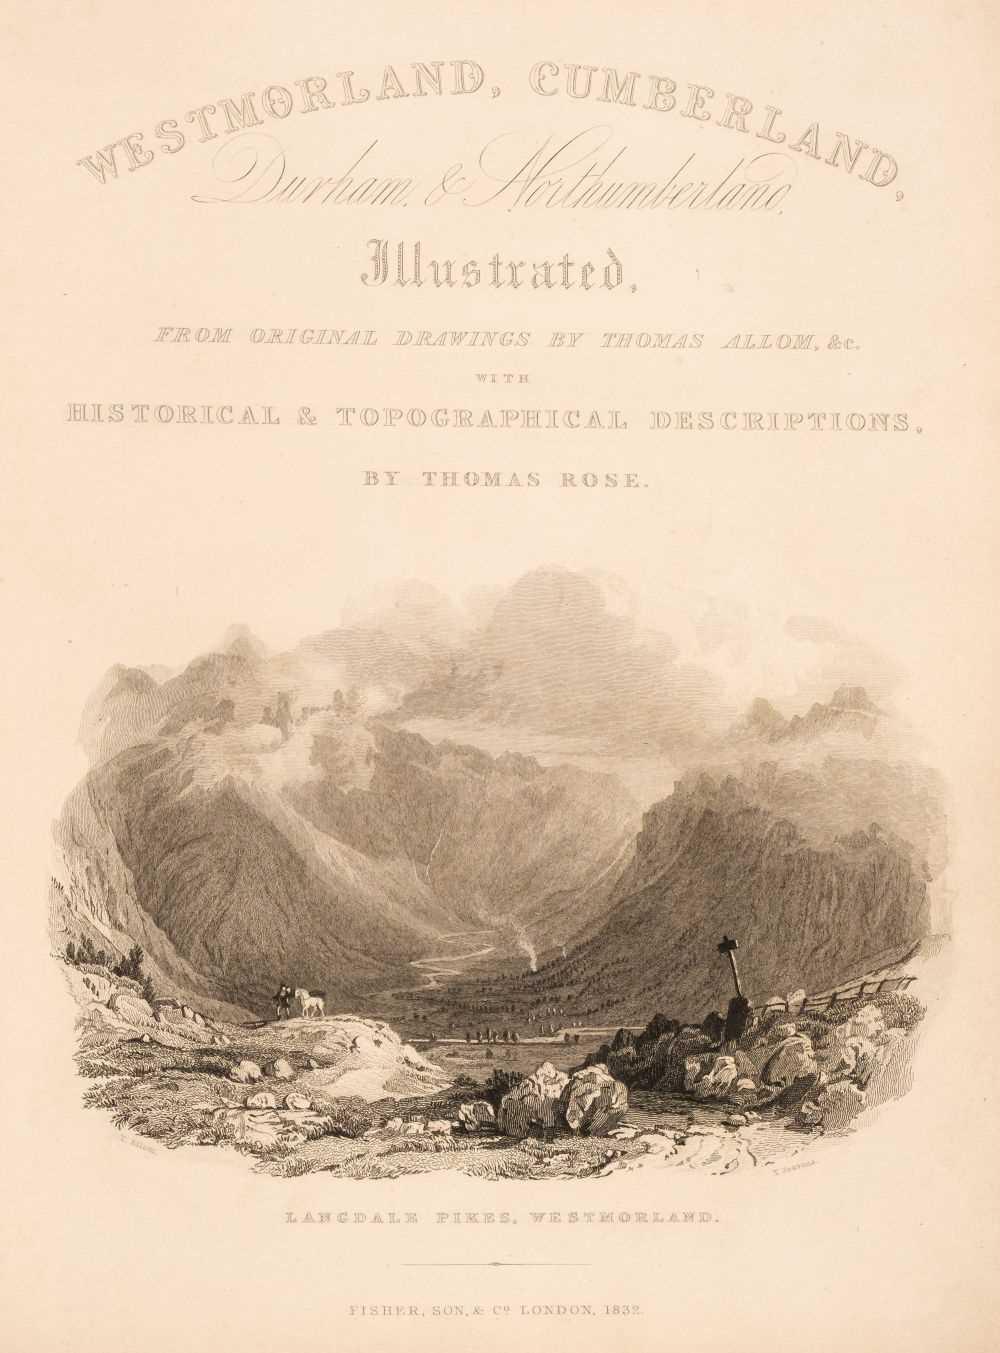 Lot 37 - Allom (Thomas & others, illustrators). Westmorland, Cumberland ... Illustrated, 1832, & 4 others